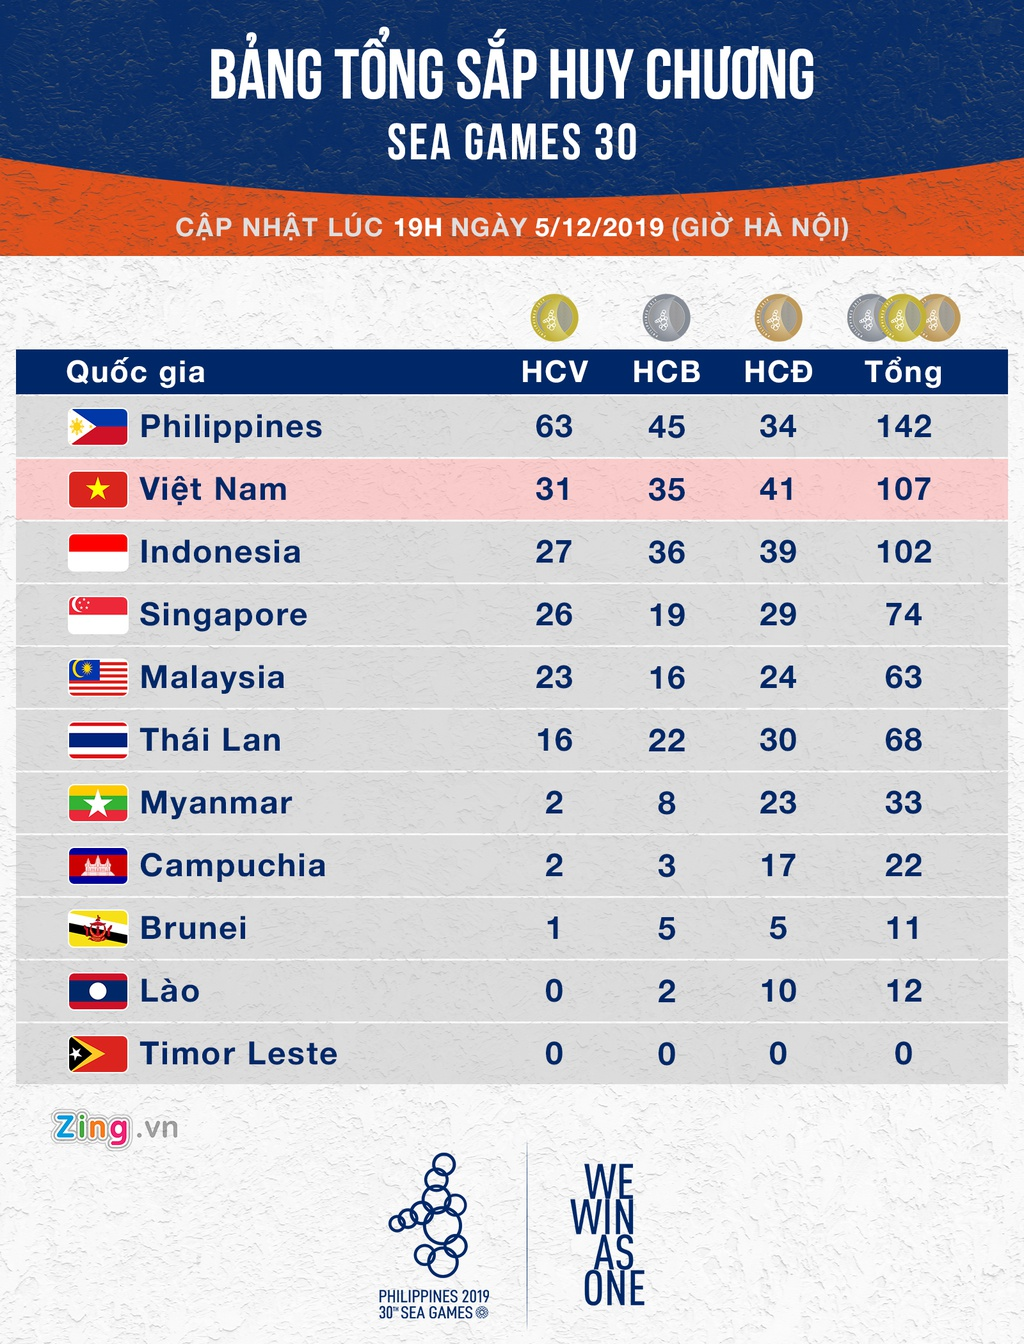 Bang tong sap huy chuong SEA Games 30: Indonesia bam duoi Viet Nam hinh anh 1